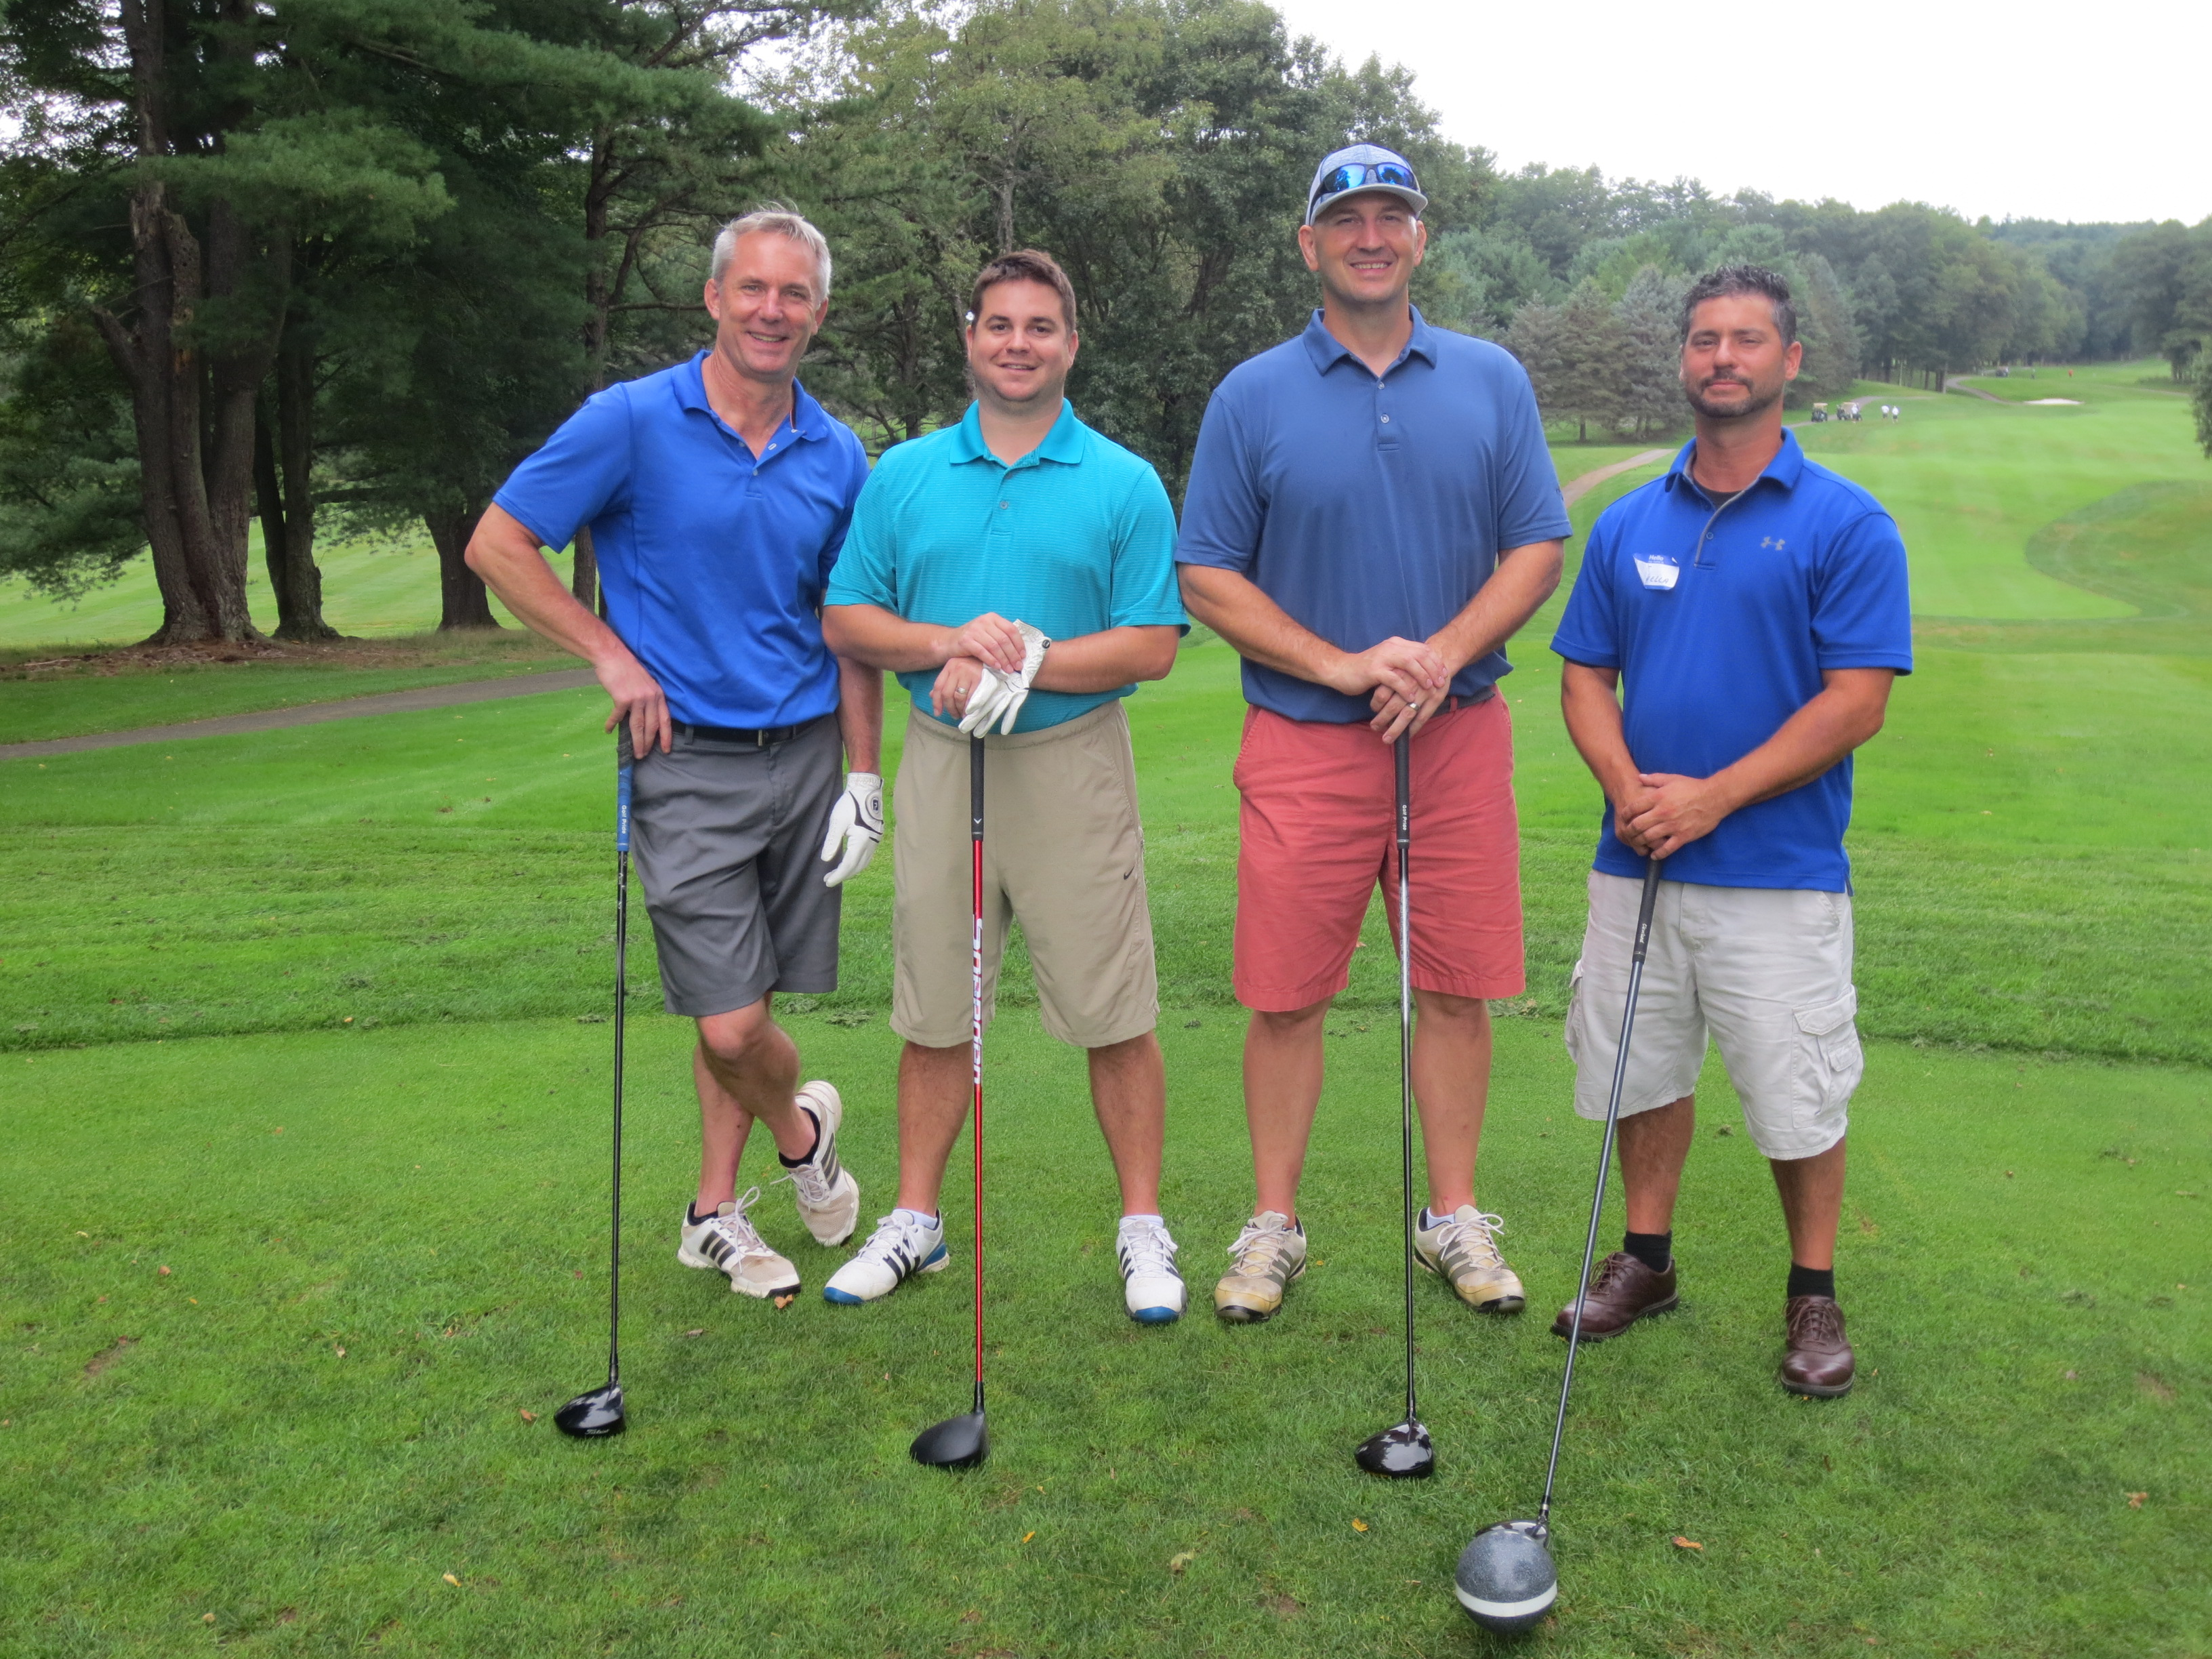 Brad Abel, Brock Armour, Mark Janus, Lee Spinella